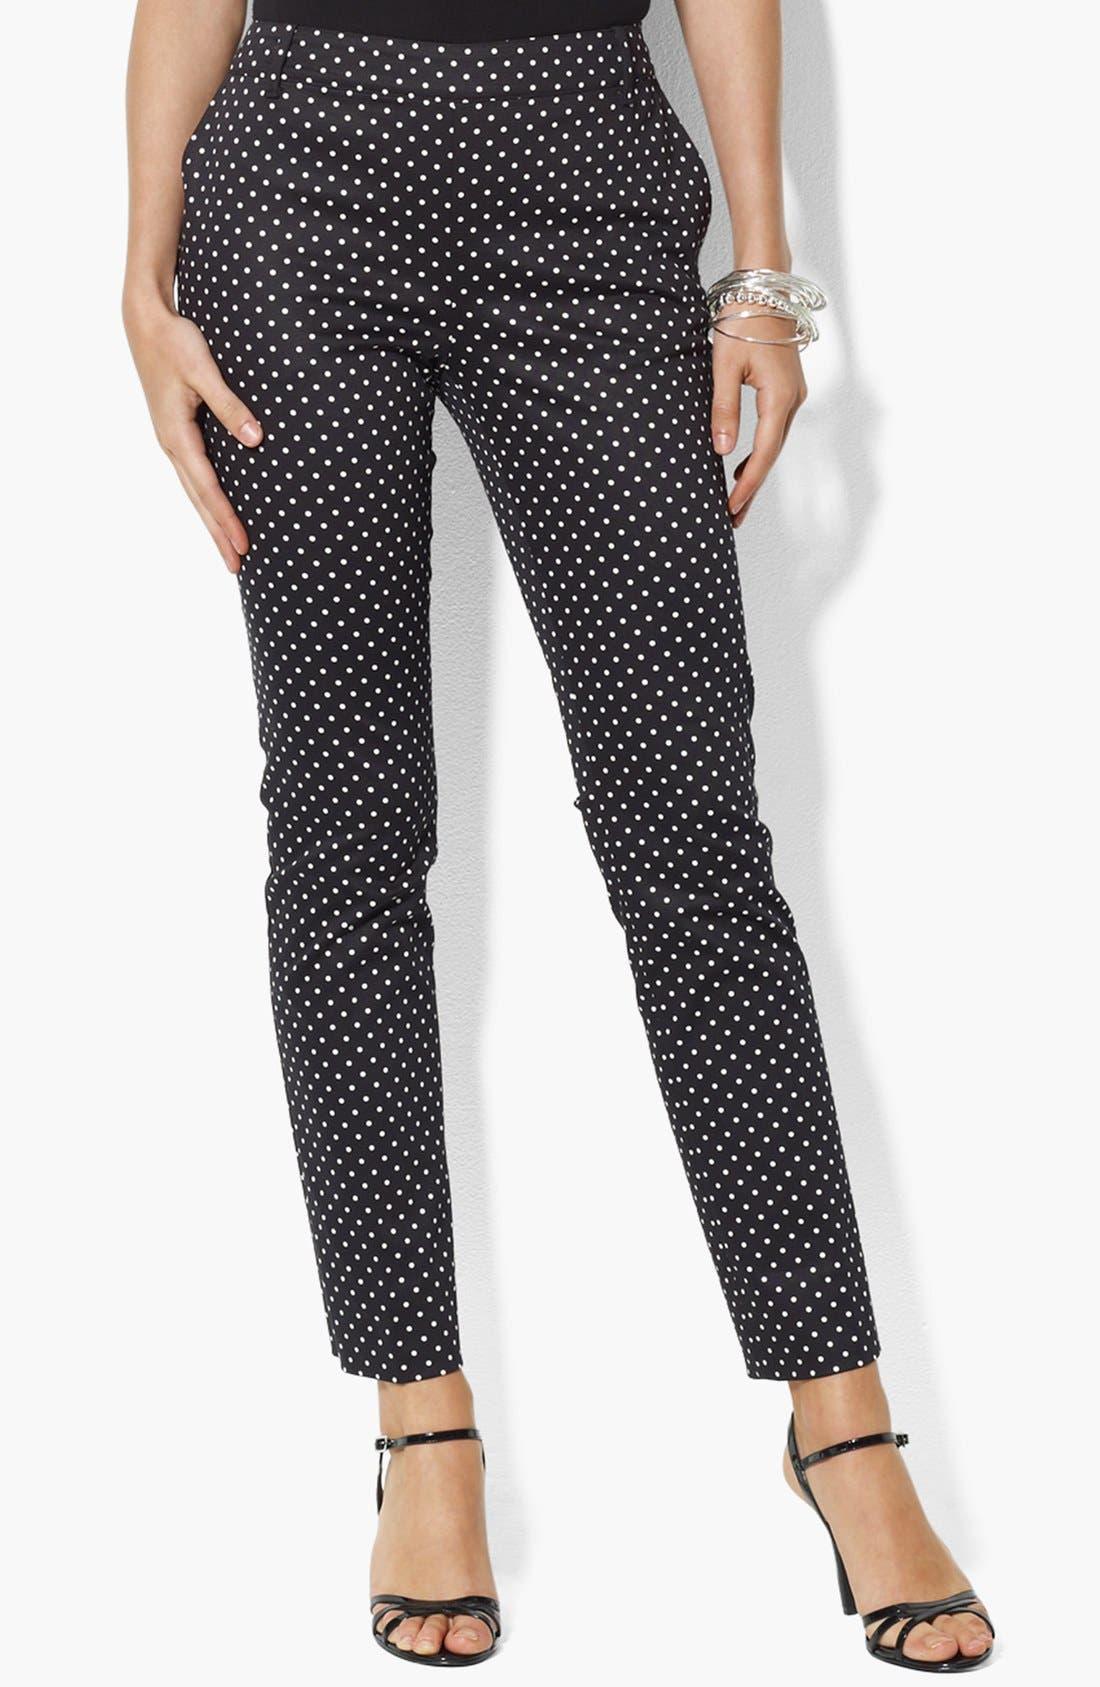 Alternate Image 1 Selected - Lauren Ralph Lauren Dot Print Ankle Pants (Petite)